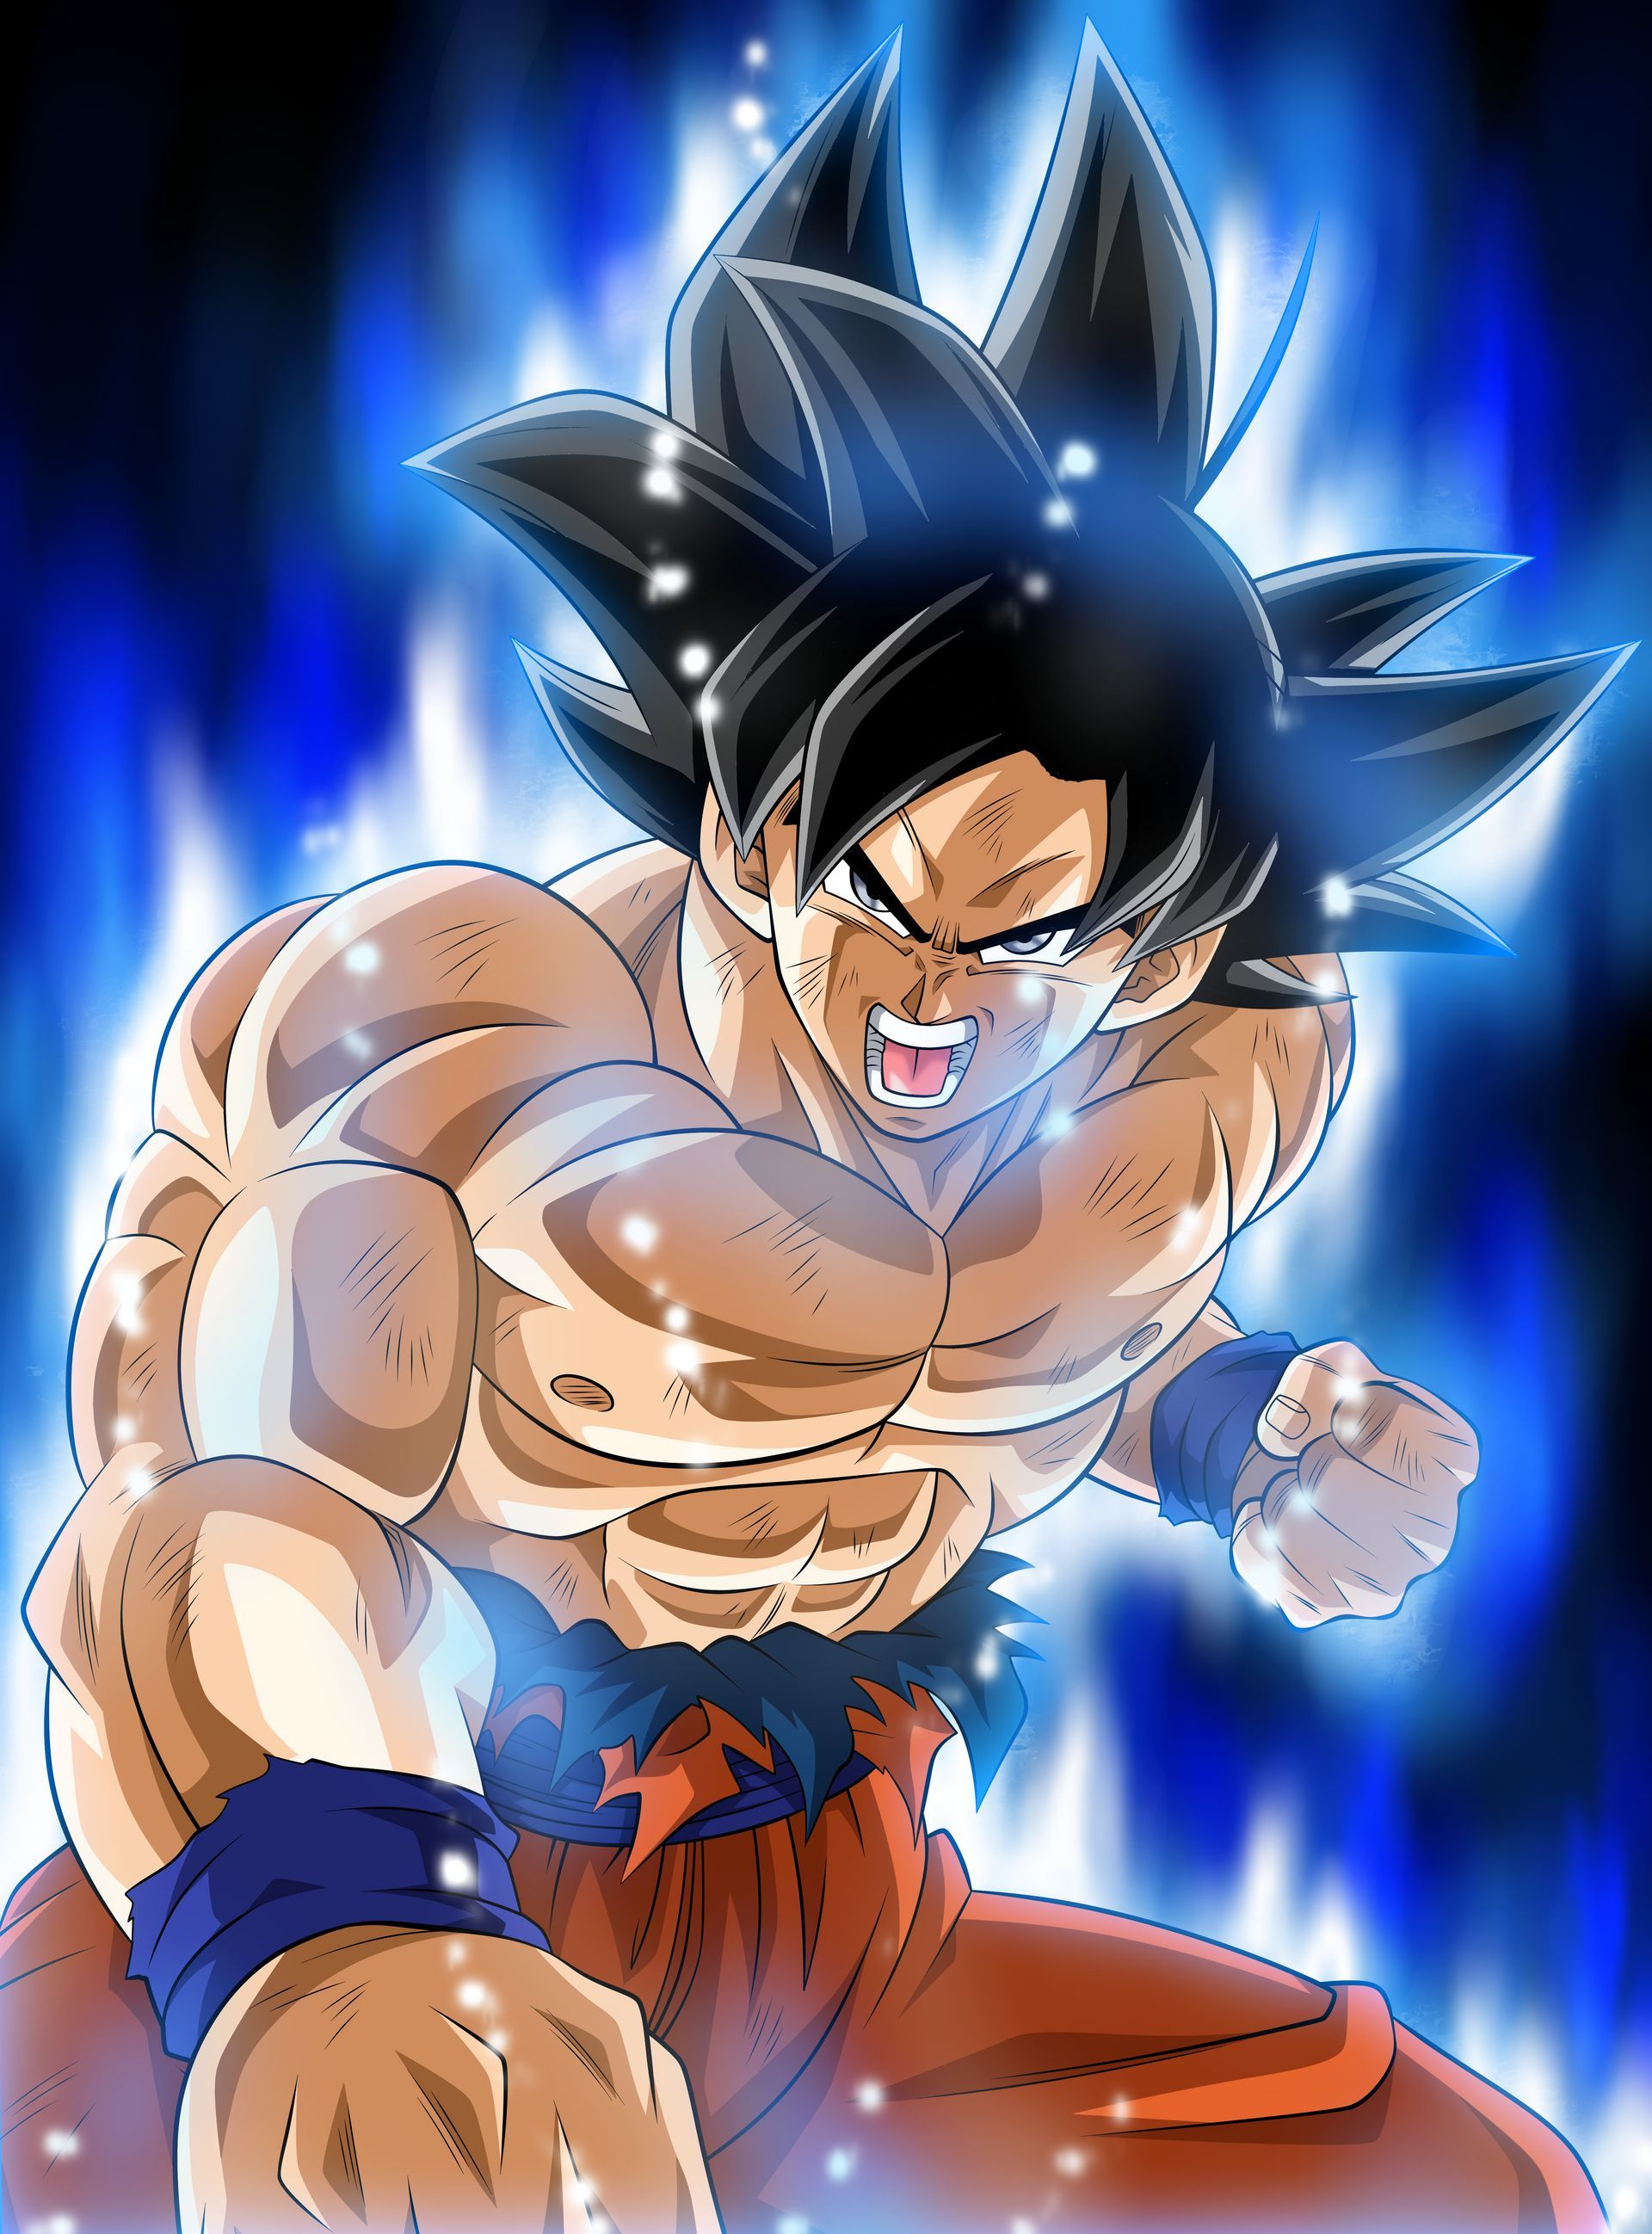 Goku Ultra Instinto Presagio Poster By Ssjrose890 On Deviantart Anime Dragon Ball Super Dragon Ball Super Manga Dragon Ball Image